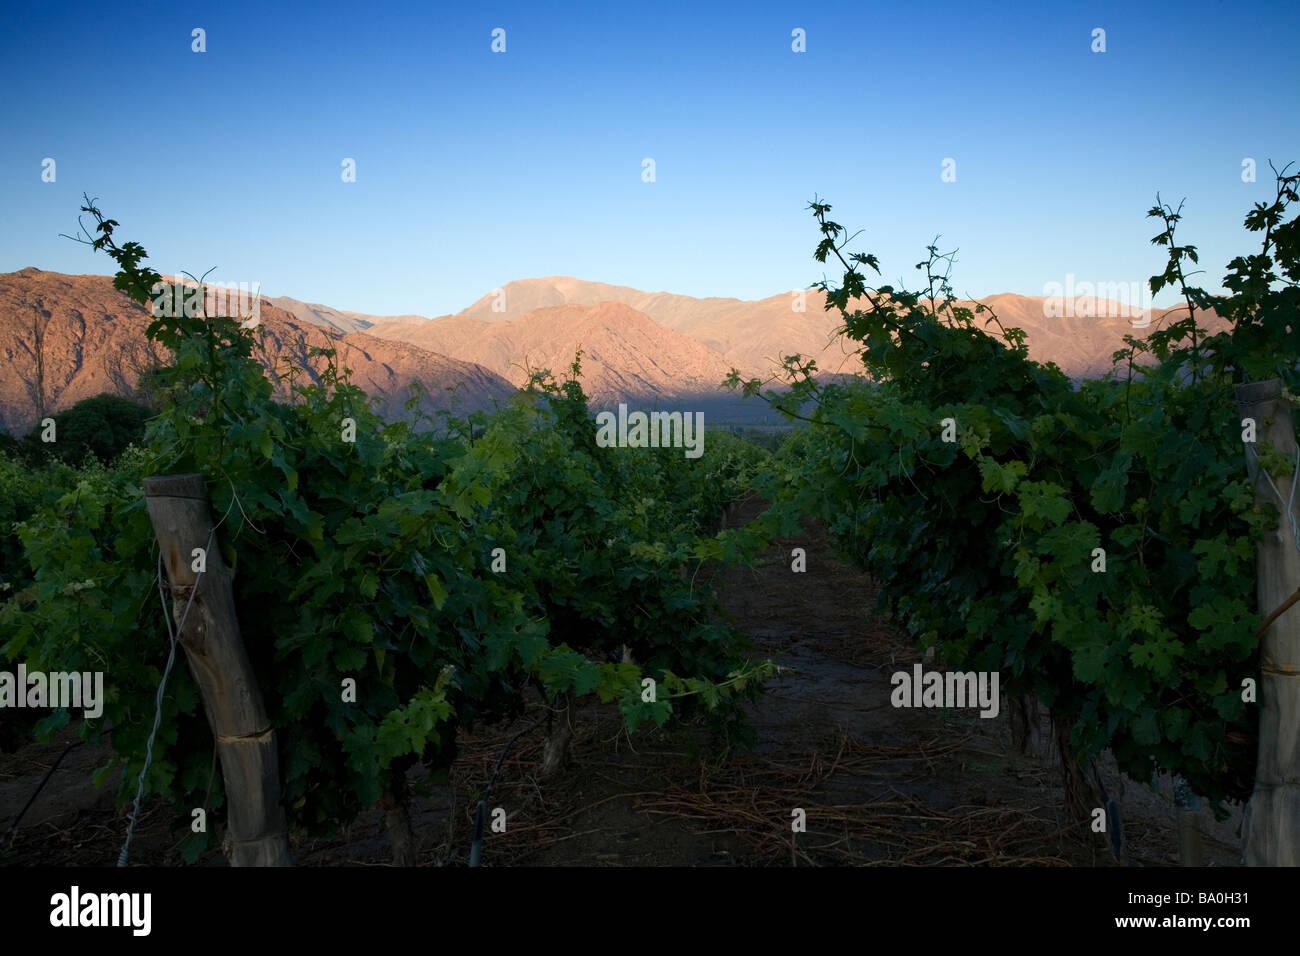 Alpen glow above vineyards, Cafayate, Argentina - Stock Image